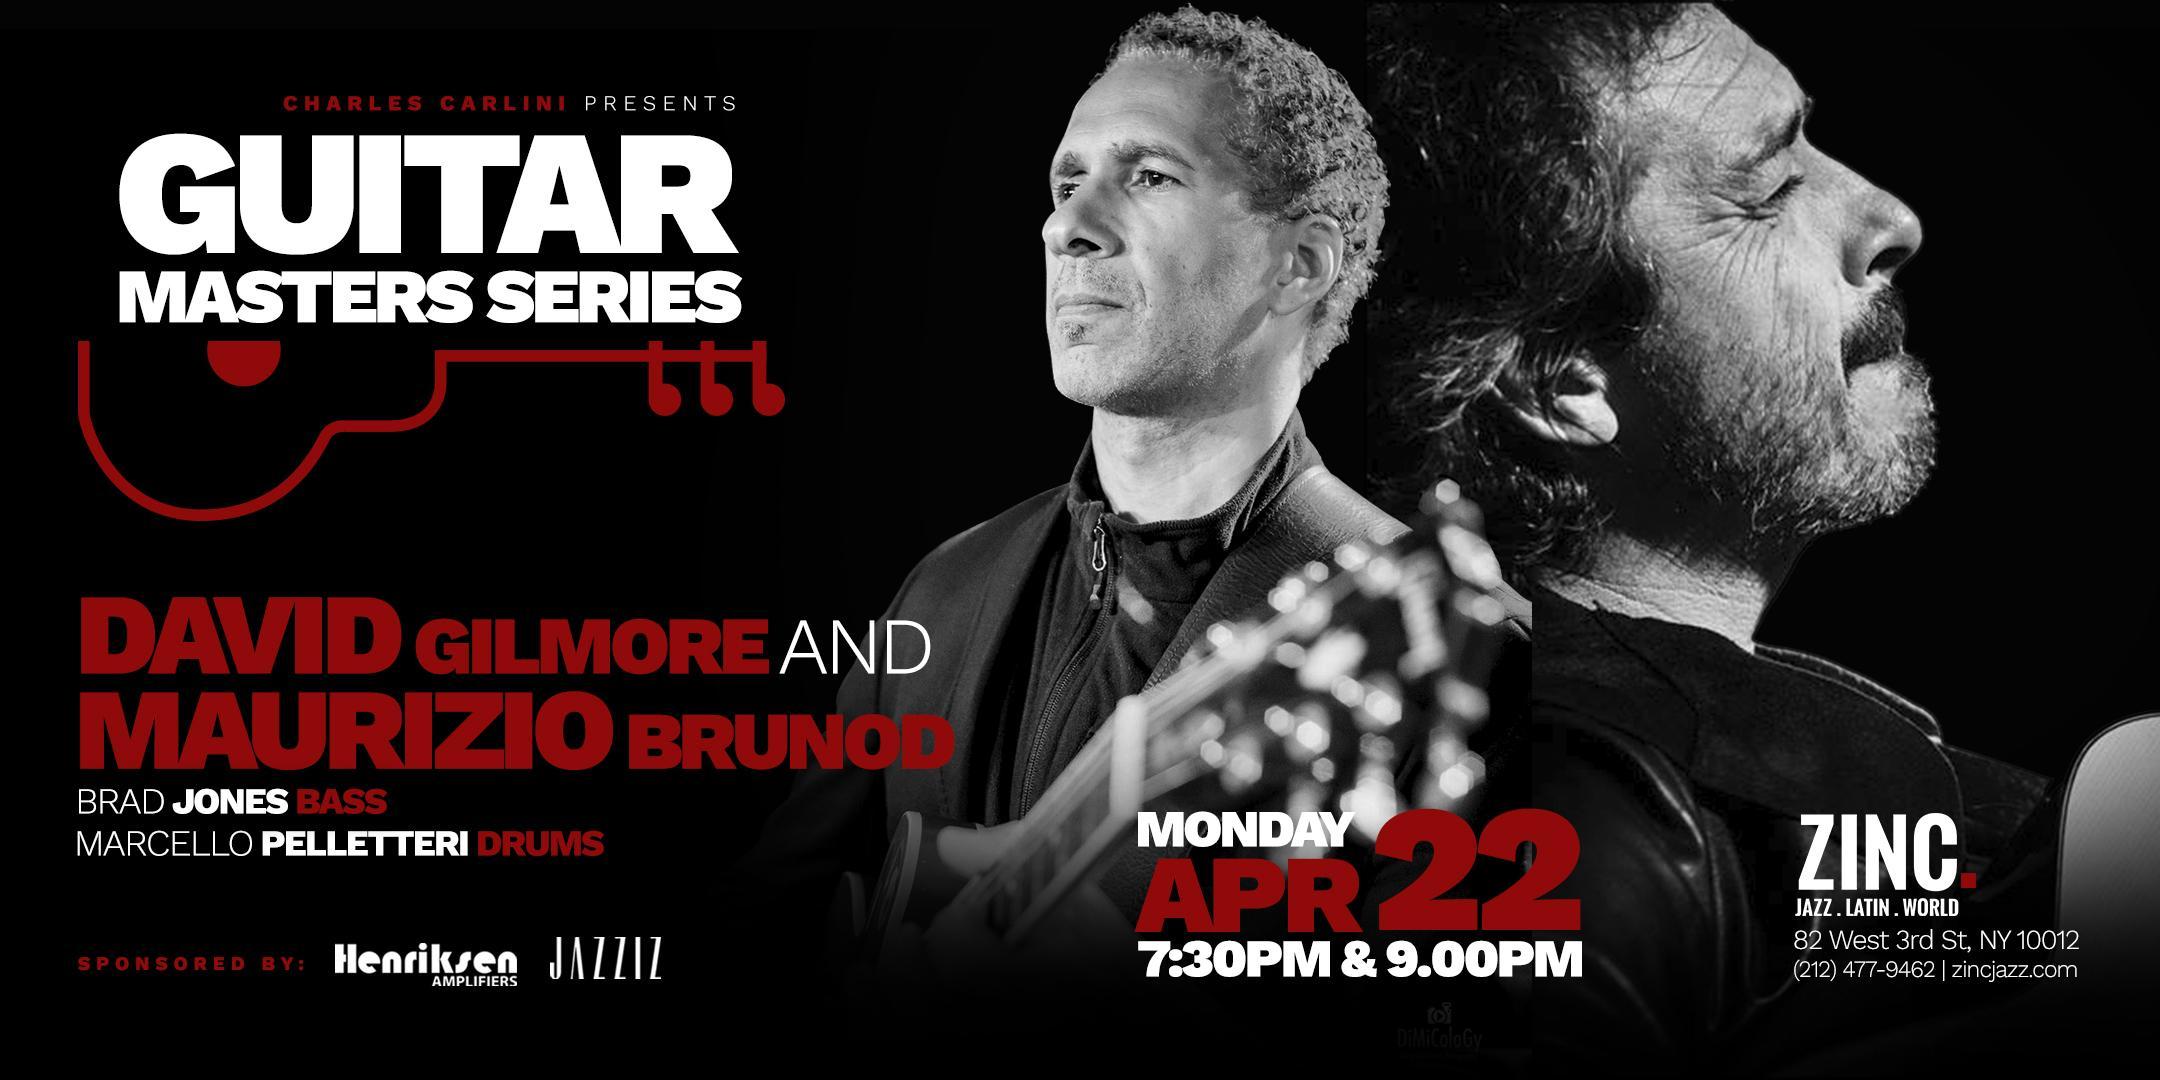 Guitar Masters Series: David Gilmore/Maurizio Brunod Quartet